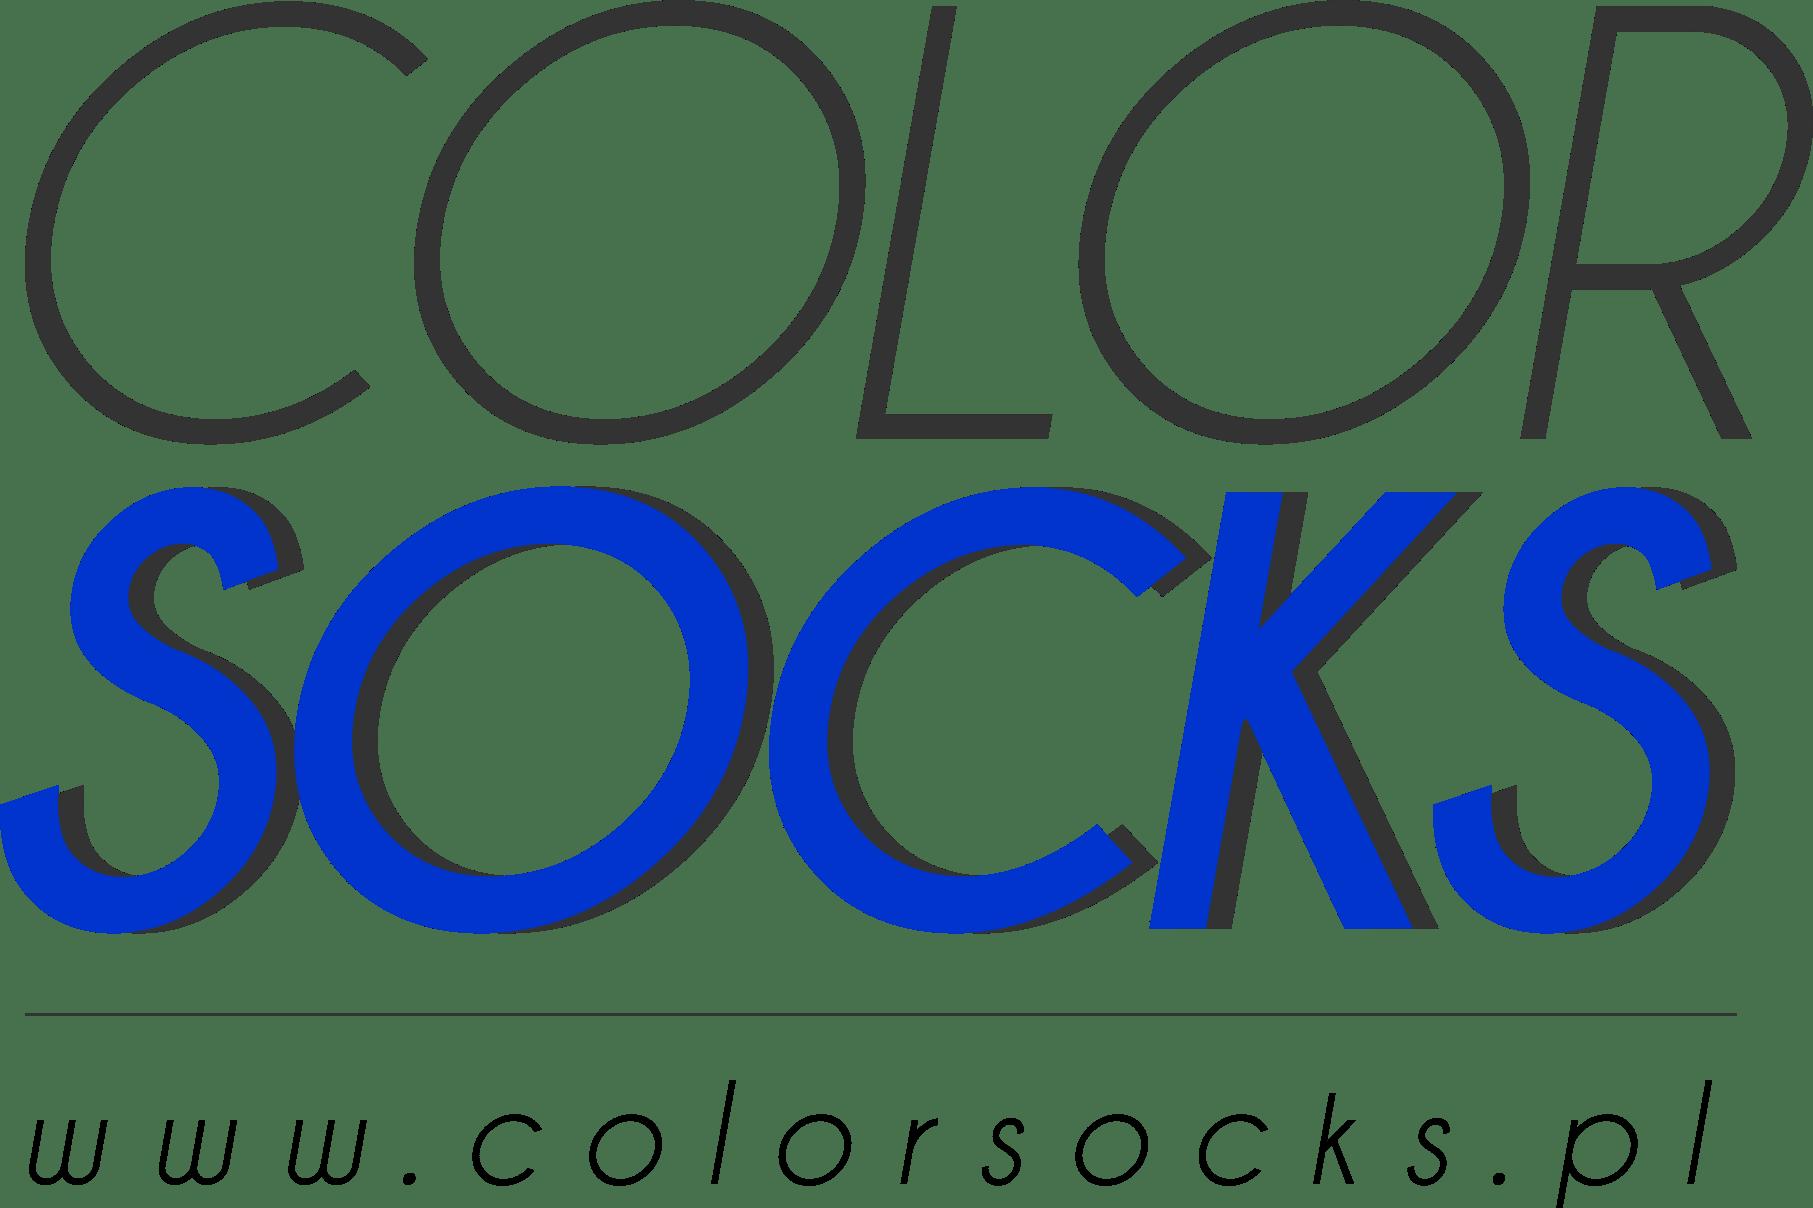 ColorSocks